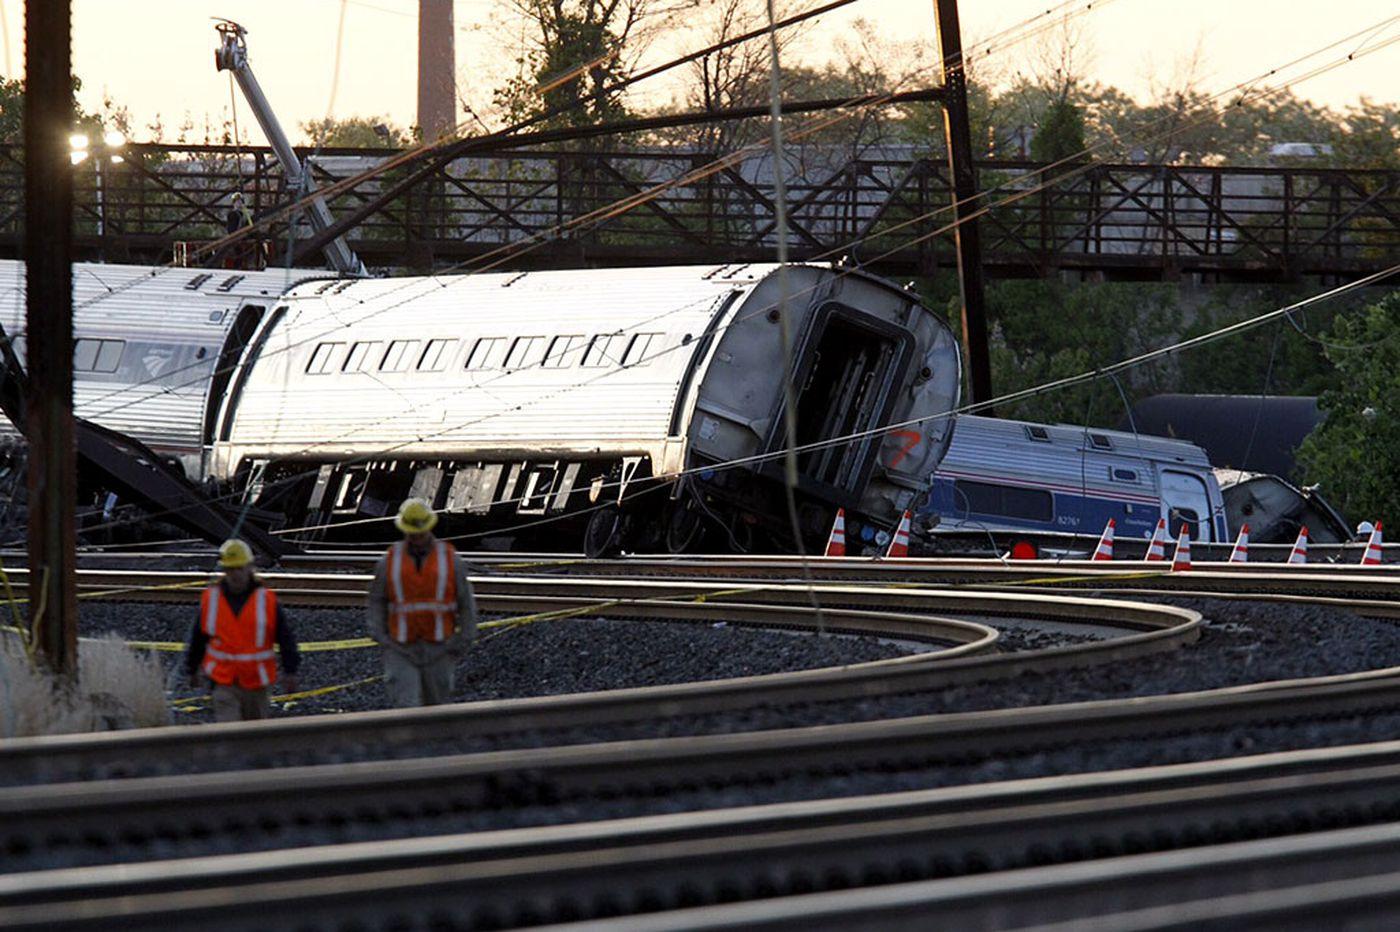 Who wants Amtrak?